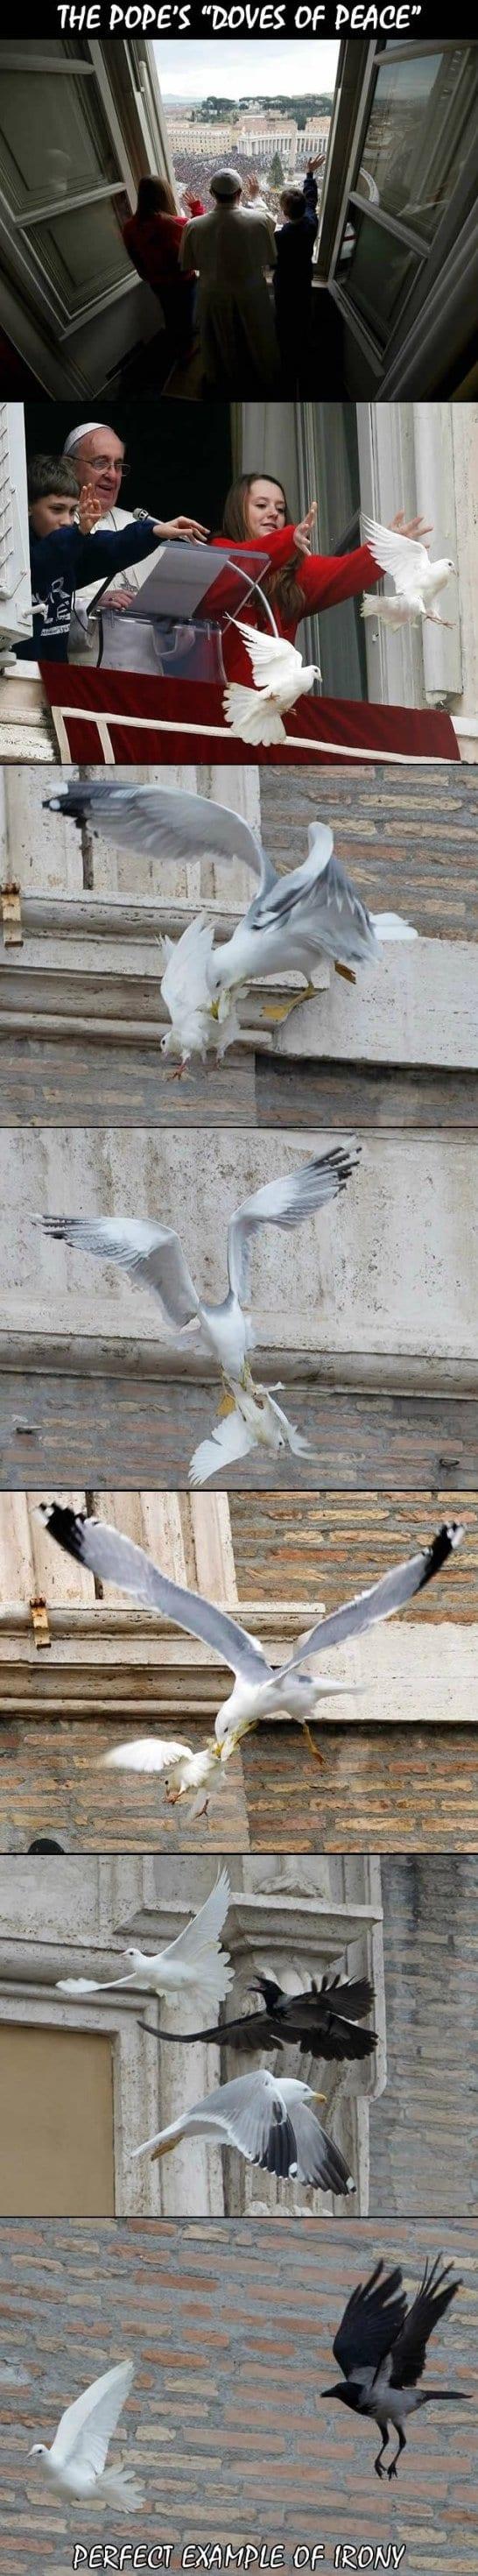 funny-popes-dove-of-peace-meme